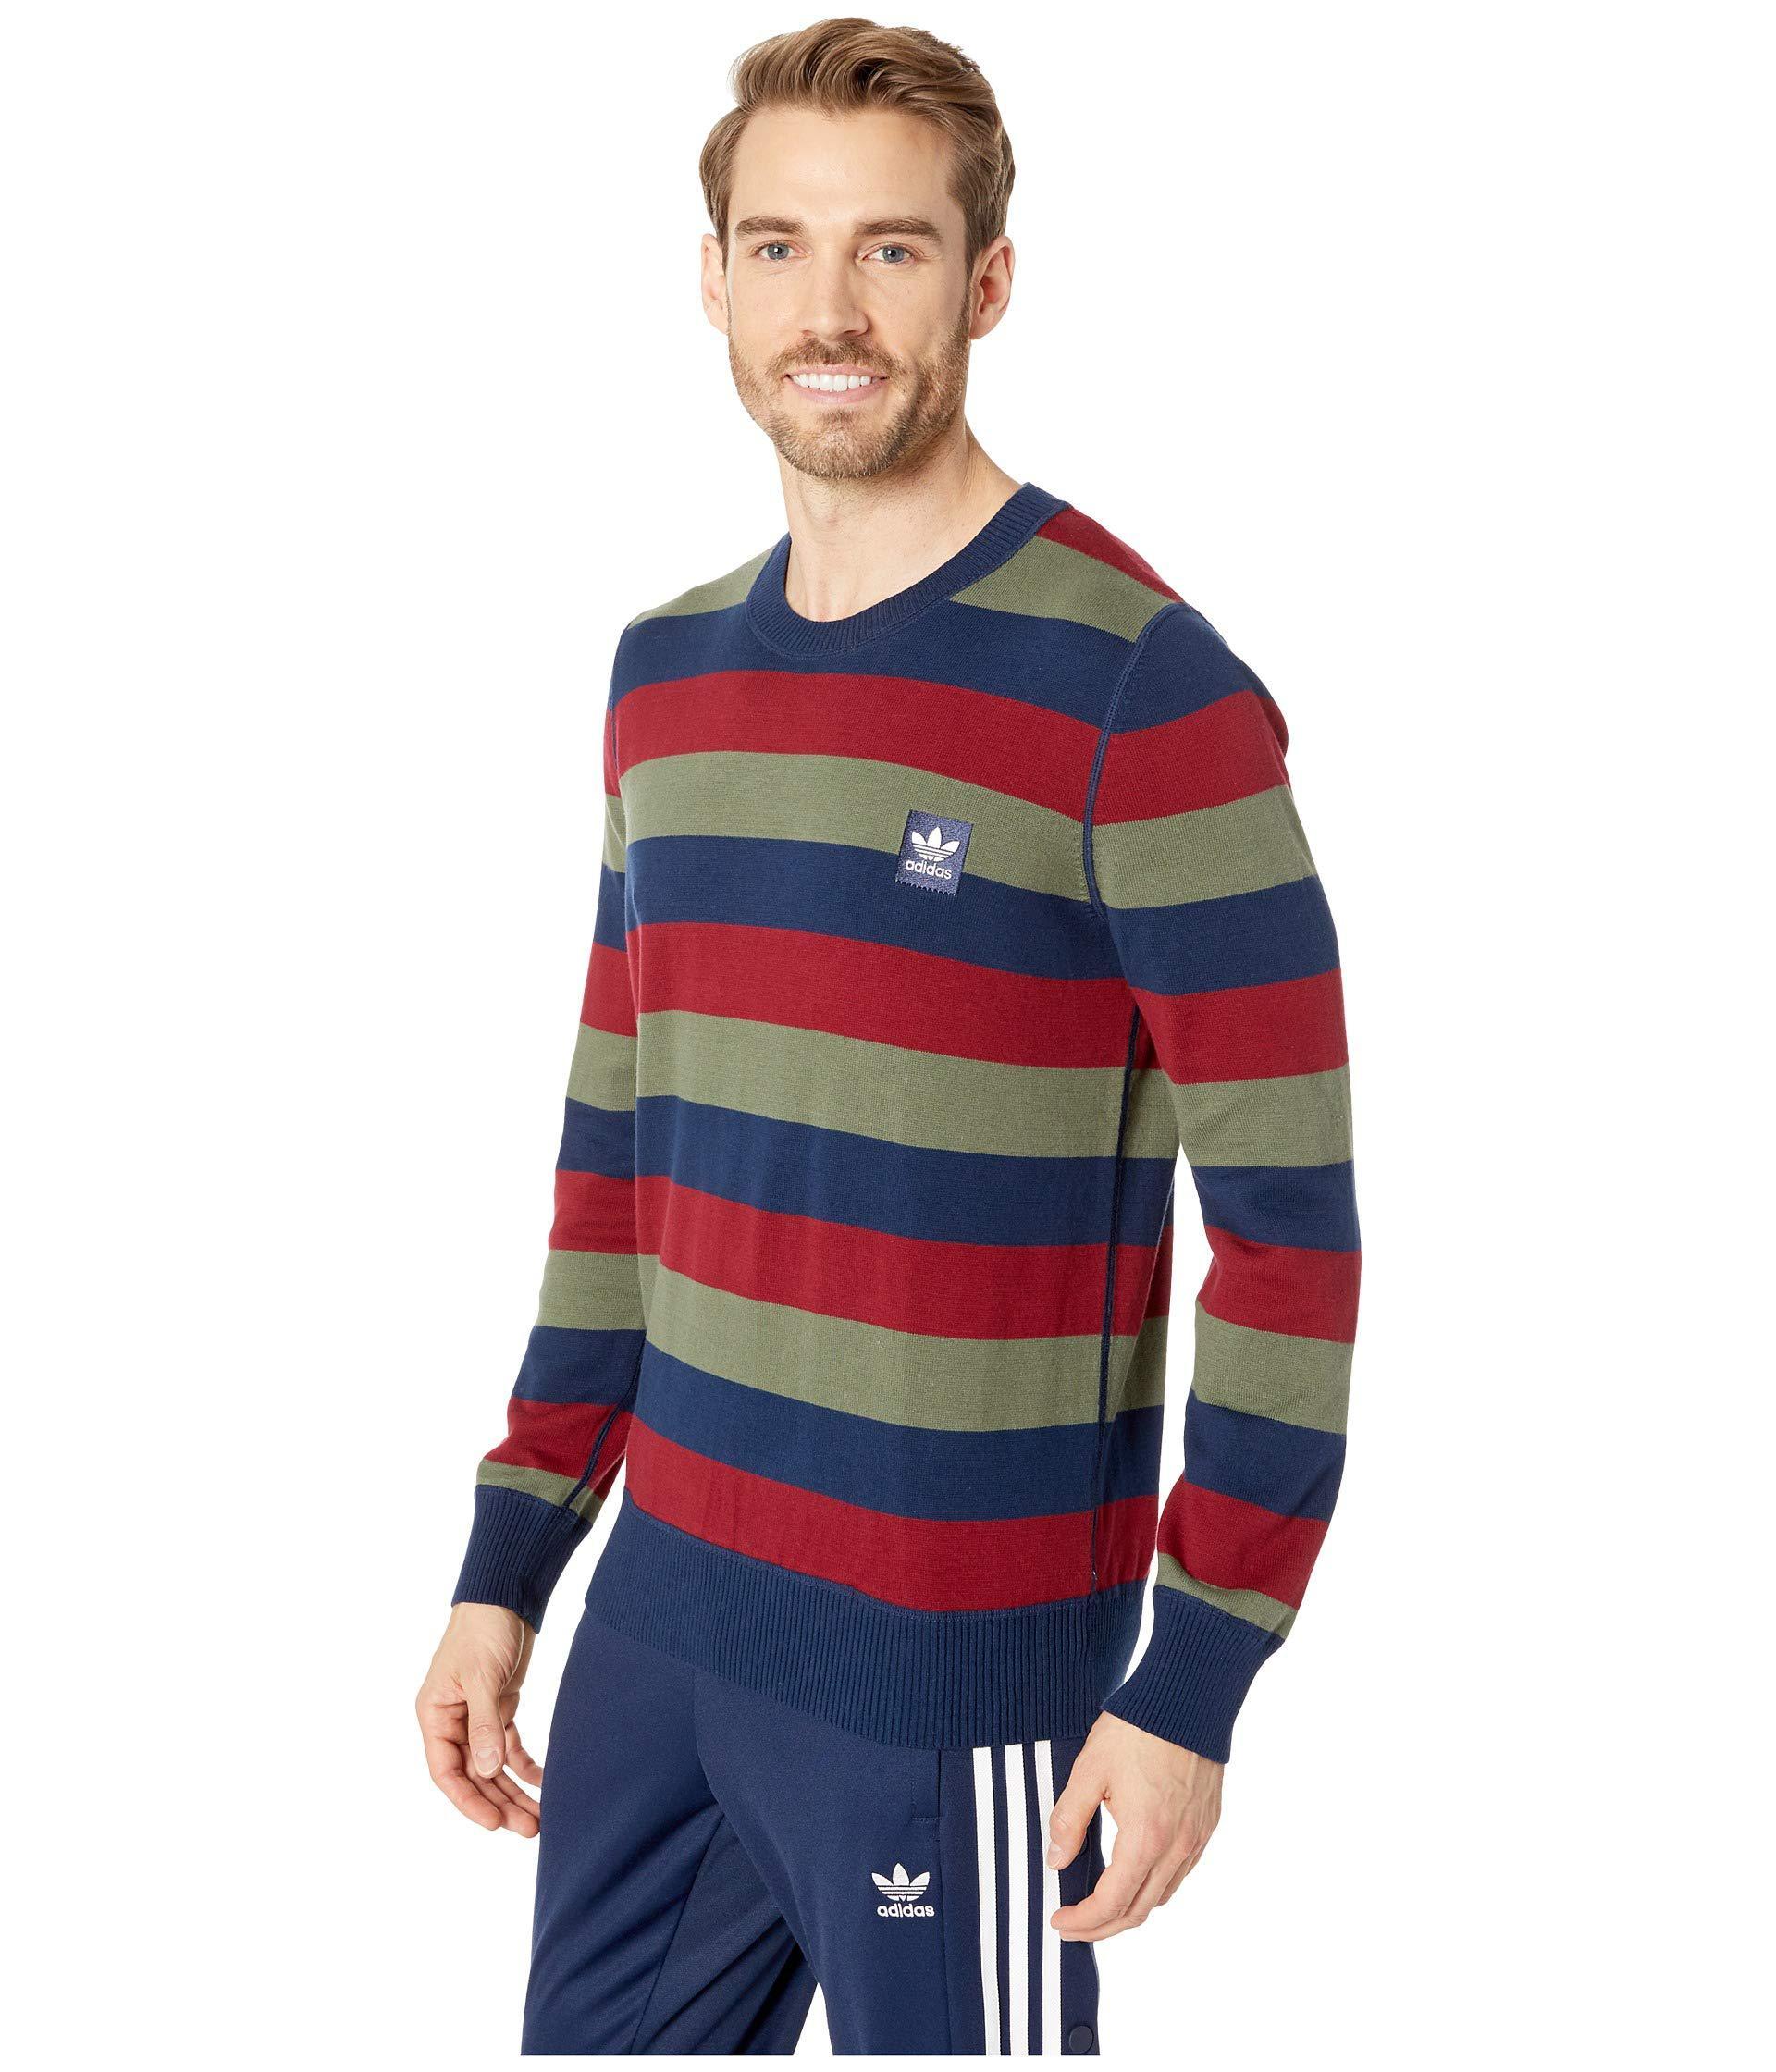 77851c0bd66a Lyst - adidas Originals Striped Sweater (collegiate Navy collegiate  Burgundy base Green) Men s Long Sleeve Pullover in Blue for Men